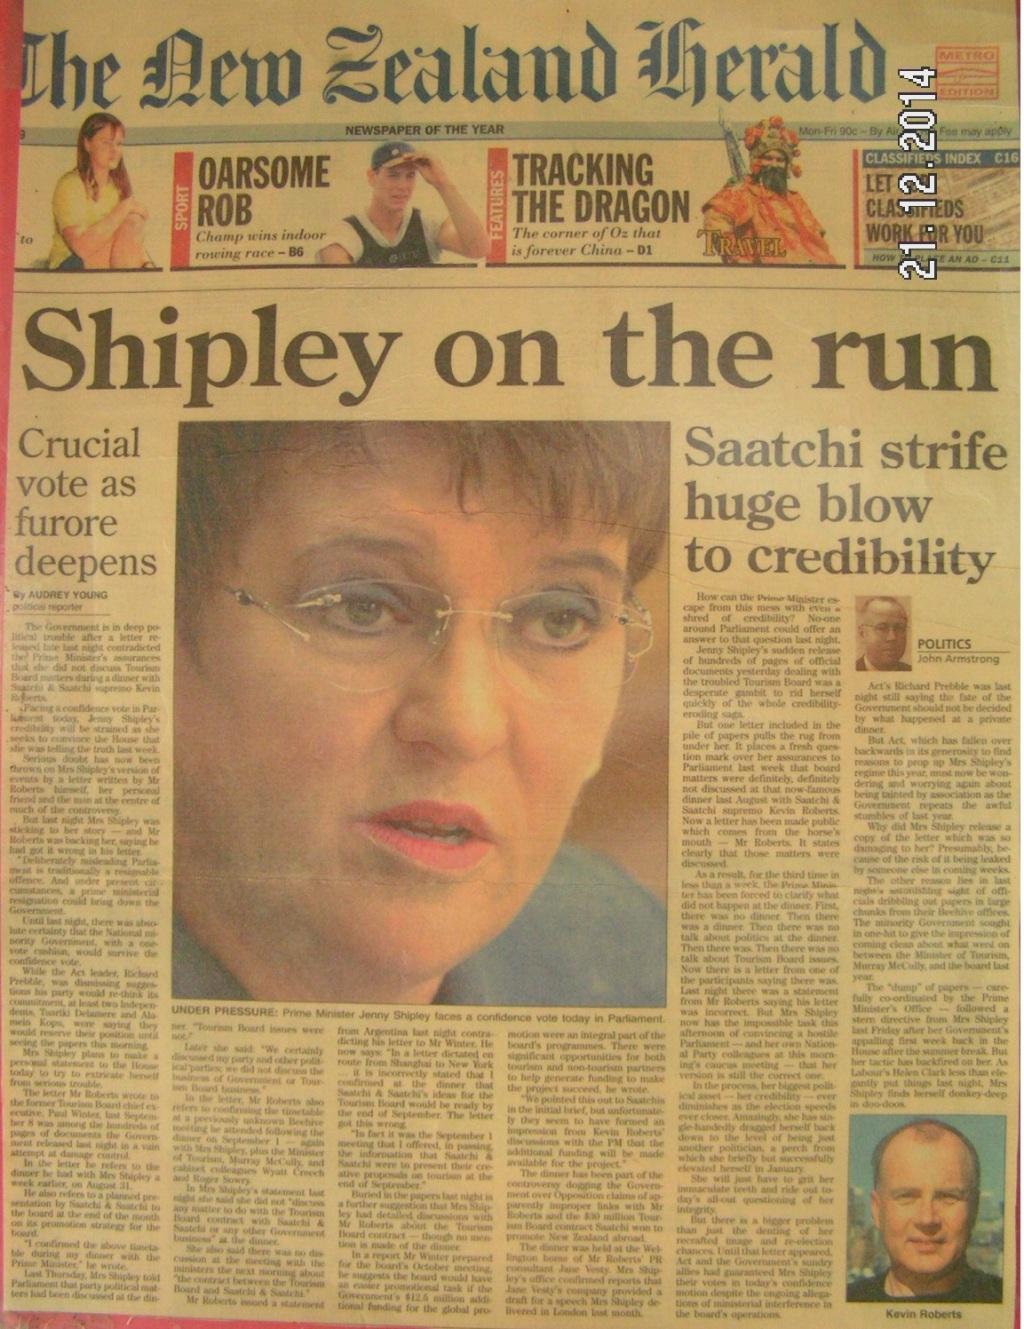 shipley-on-the-run-nz-herald-23-february-1999